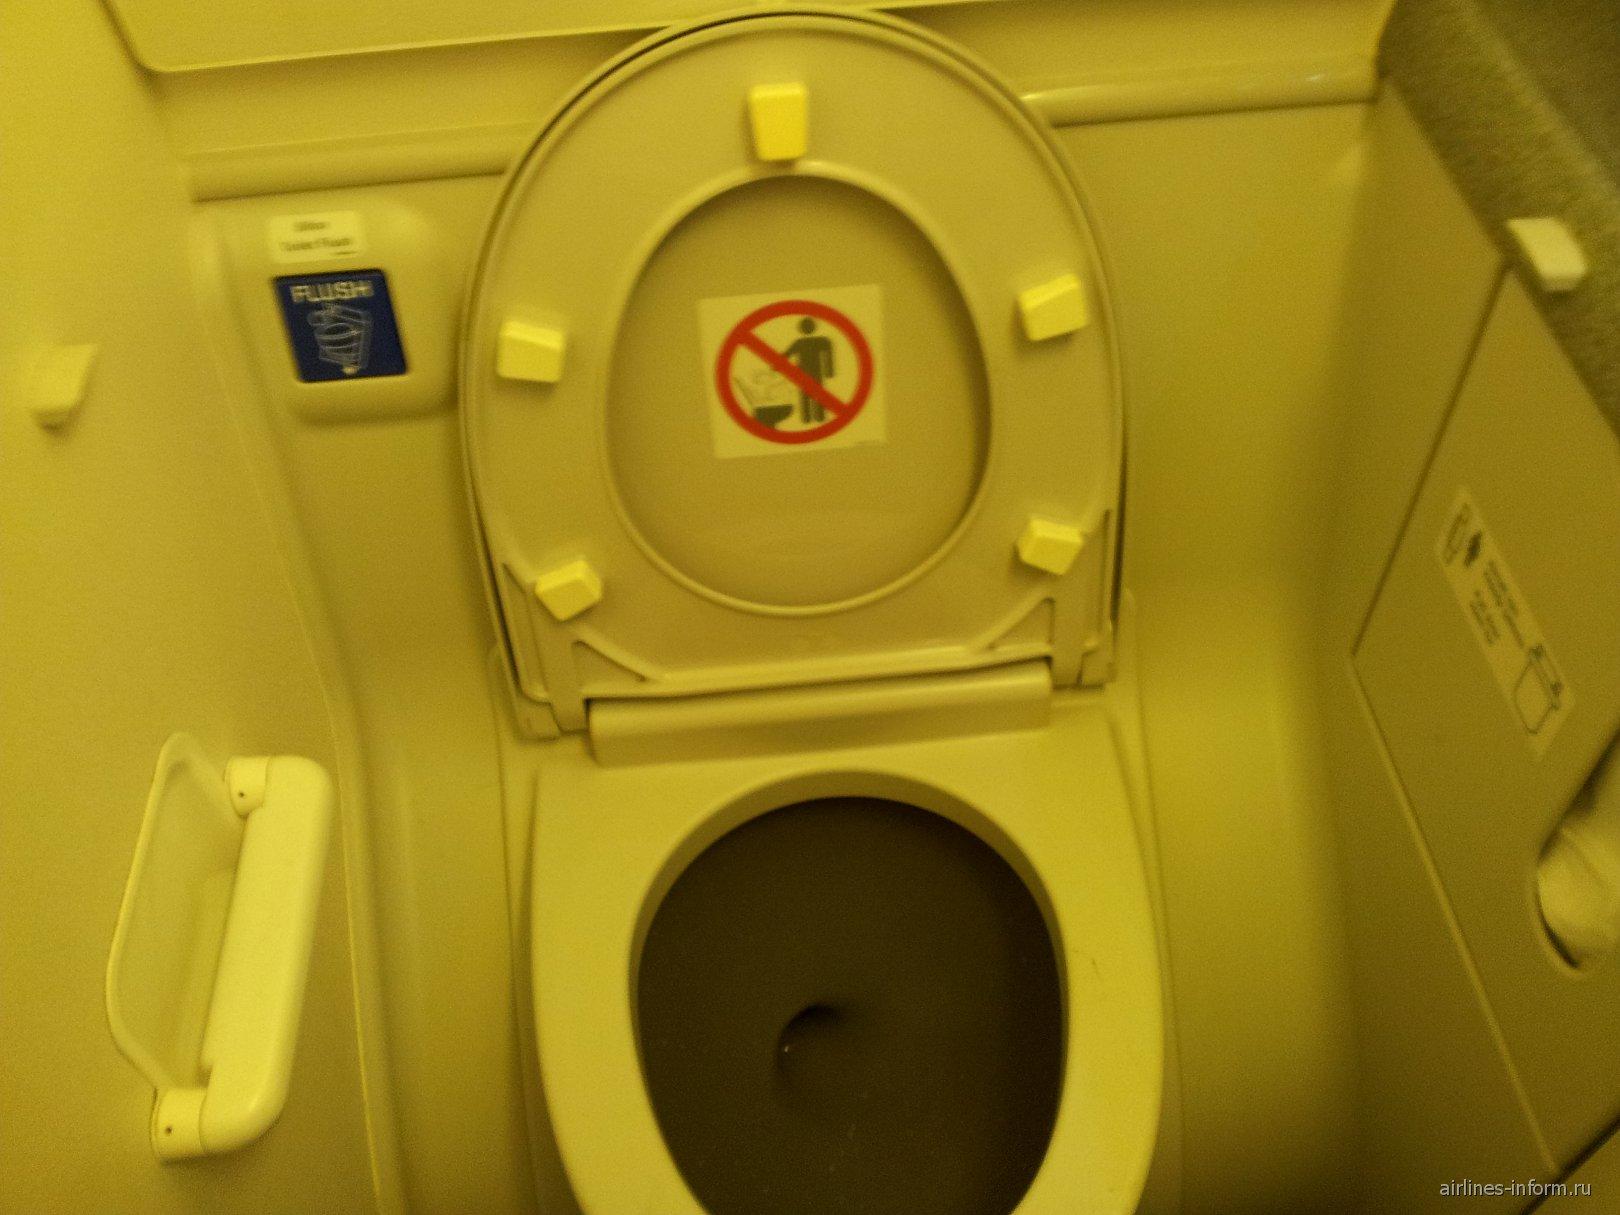 Туалет самолета Боинг-737-800 Турецких авиалиний